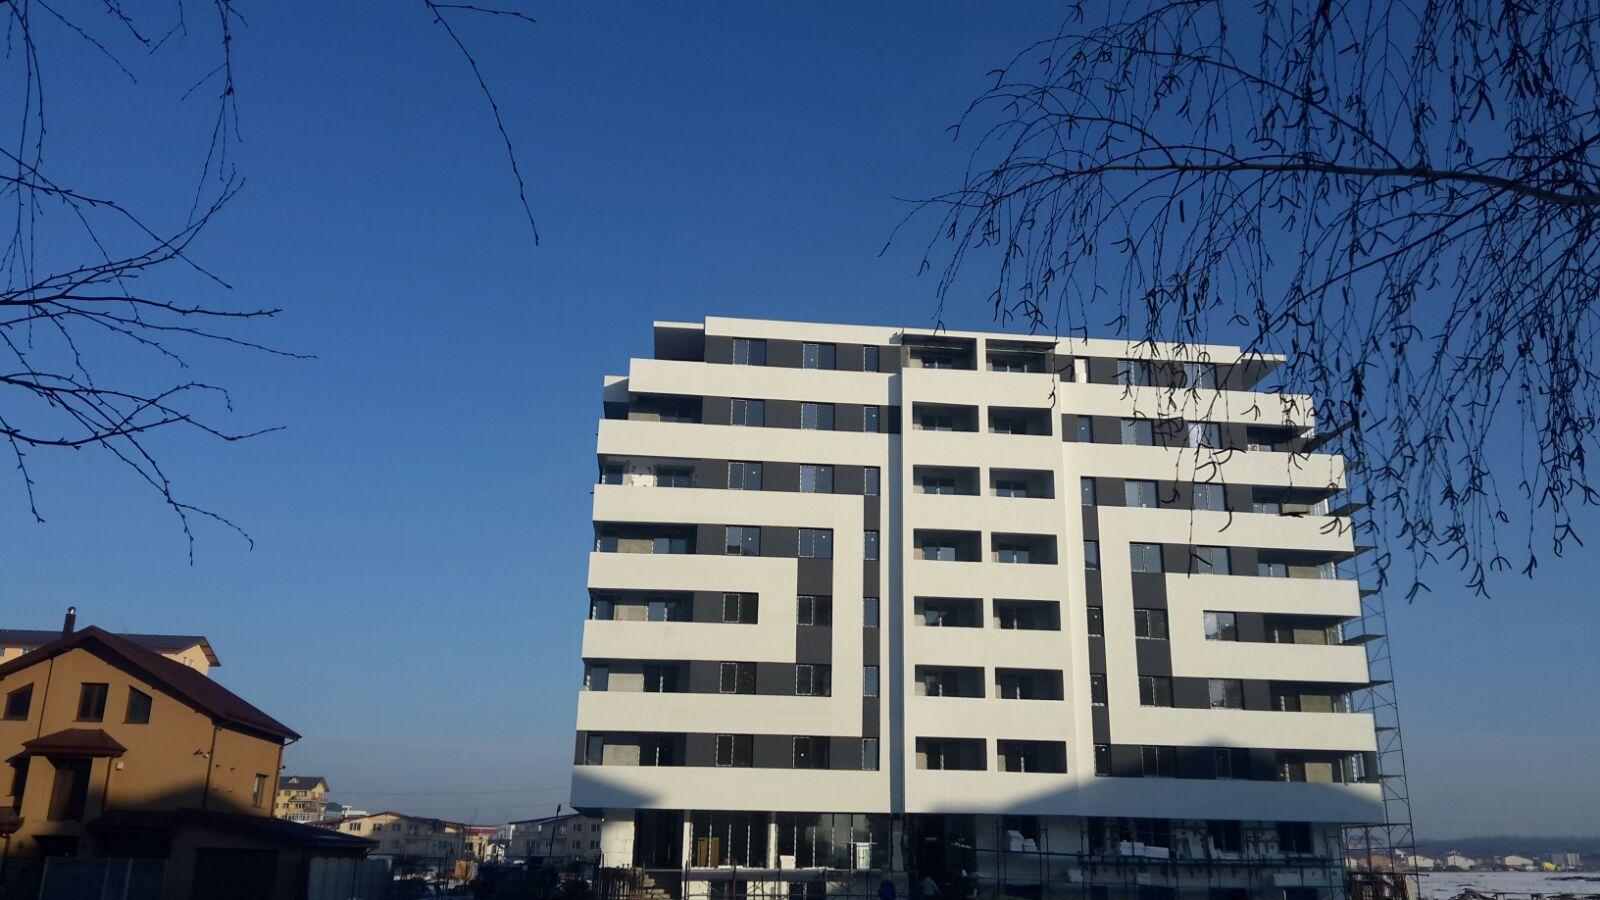 Apartament 3 camere,70 mp utili,Rezervelor 79